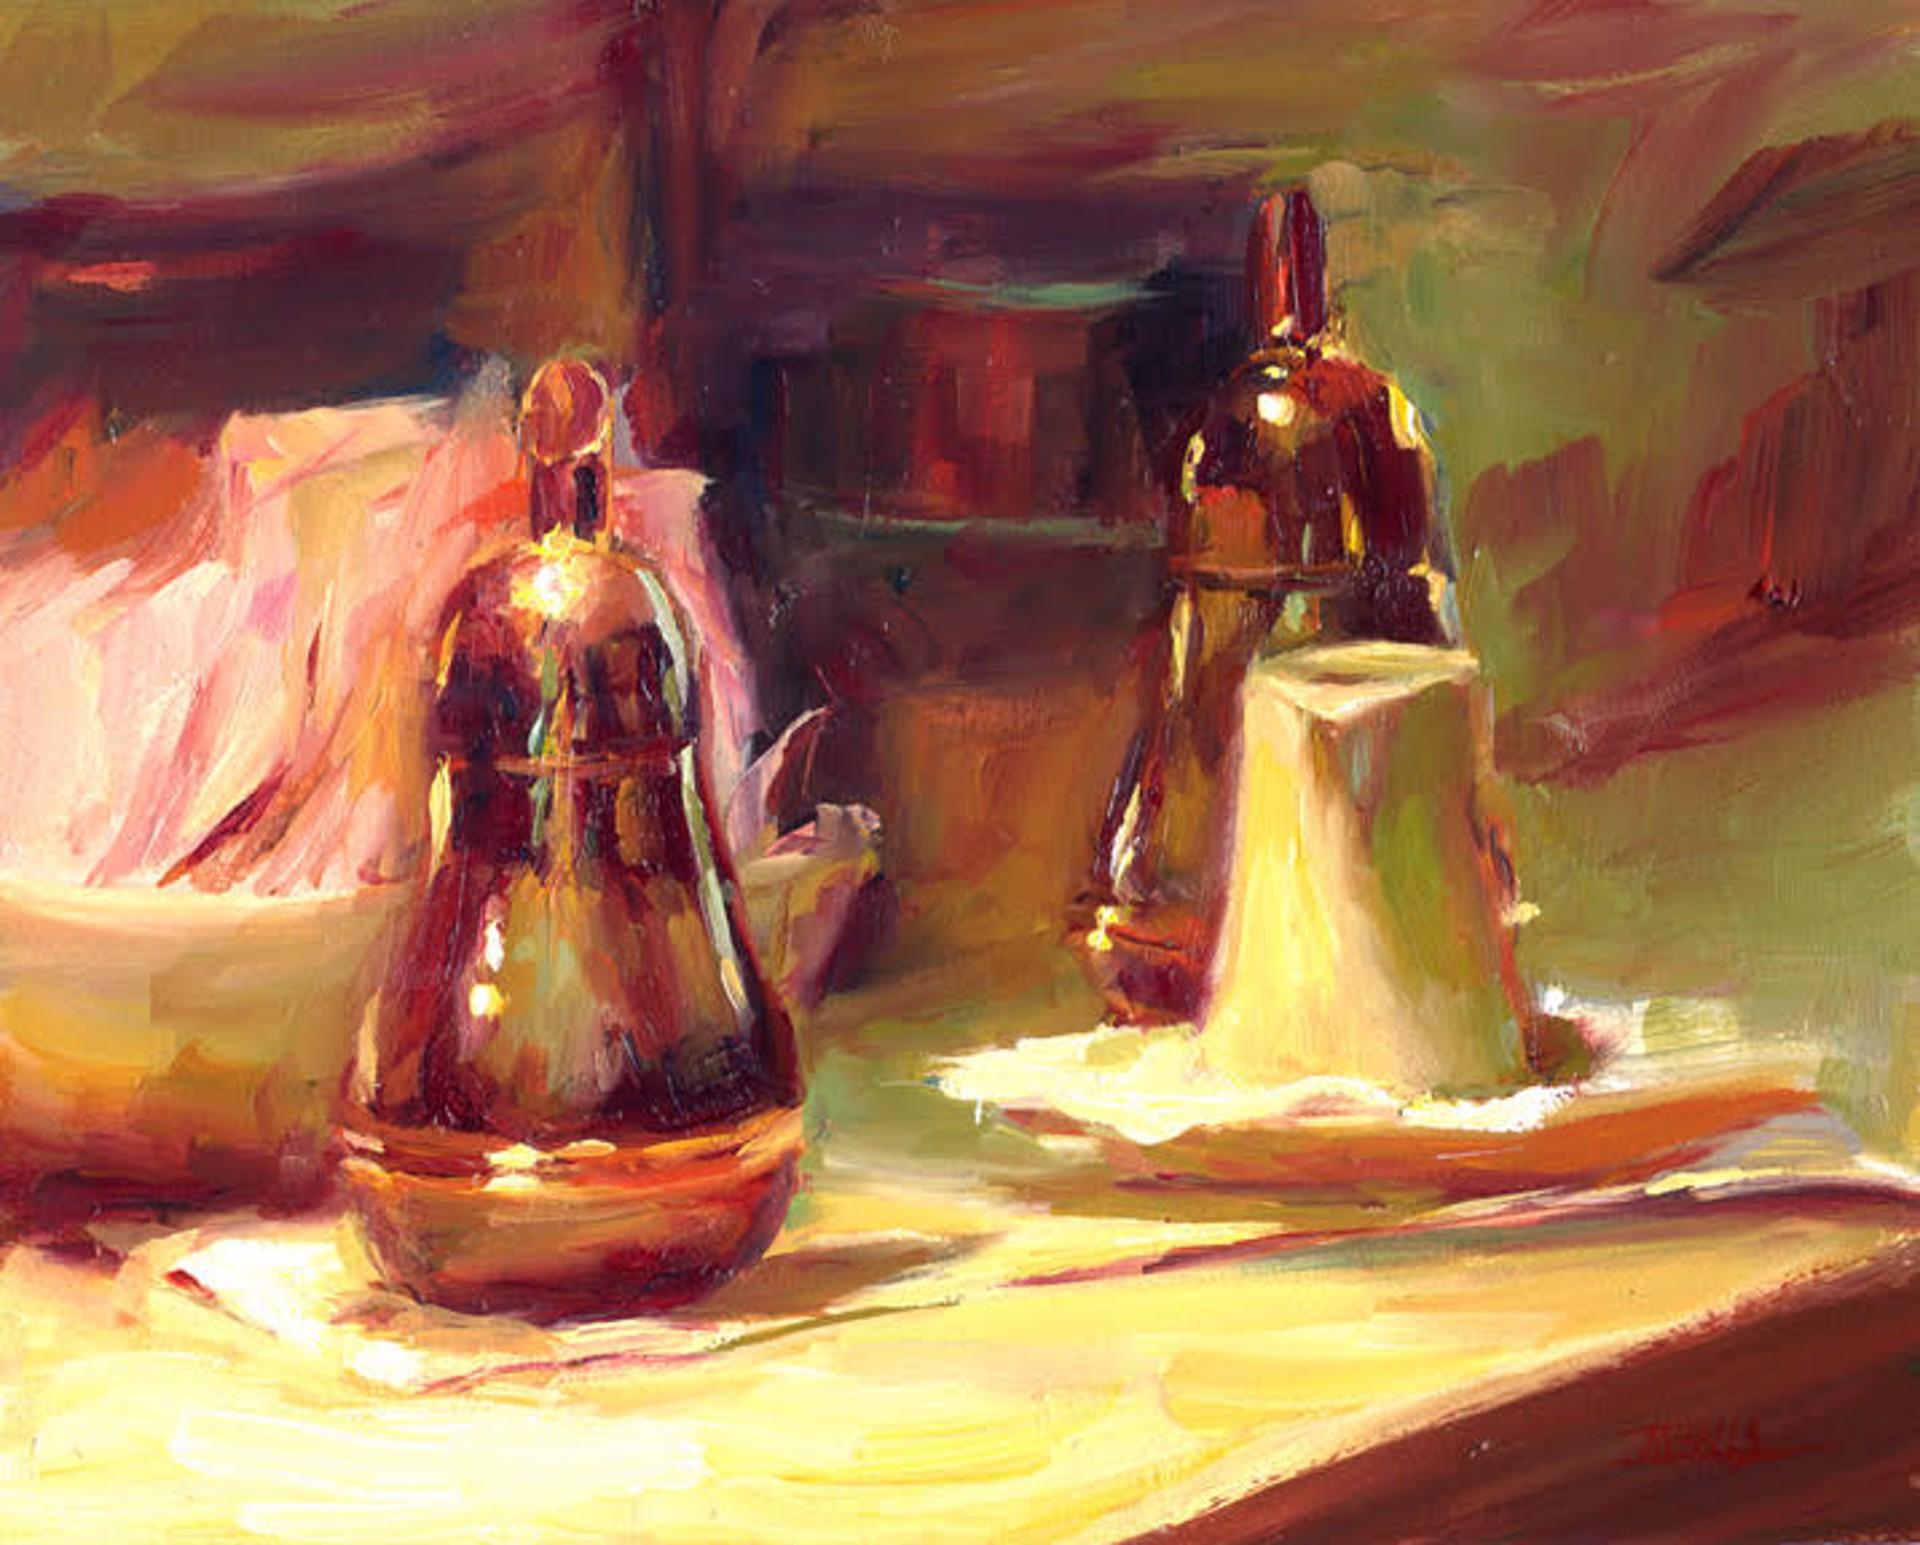 Sugar, Sugar by Pam Ingalls